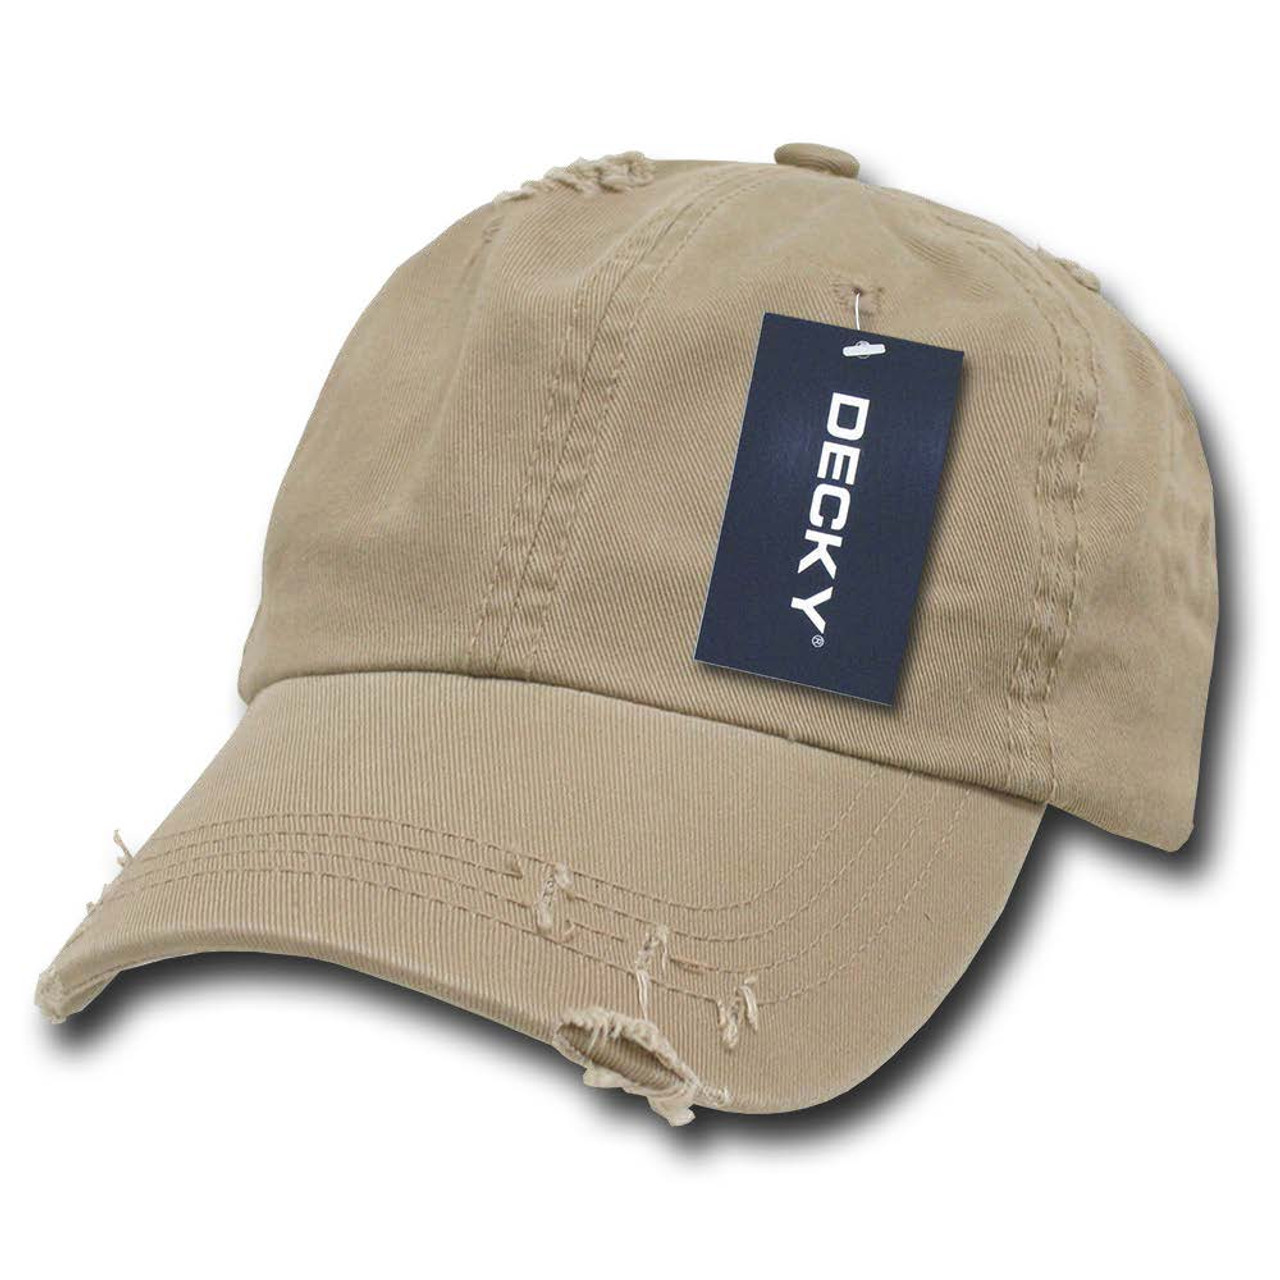 Khaki Vintage Distressed Retro Polo Low Profile Baseball Cap Golf Hat Hats  Caps 91e274e706a